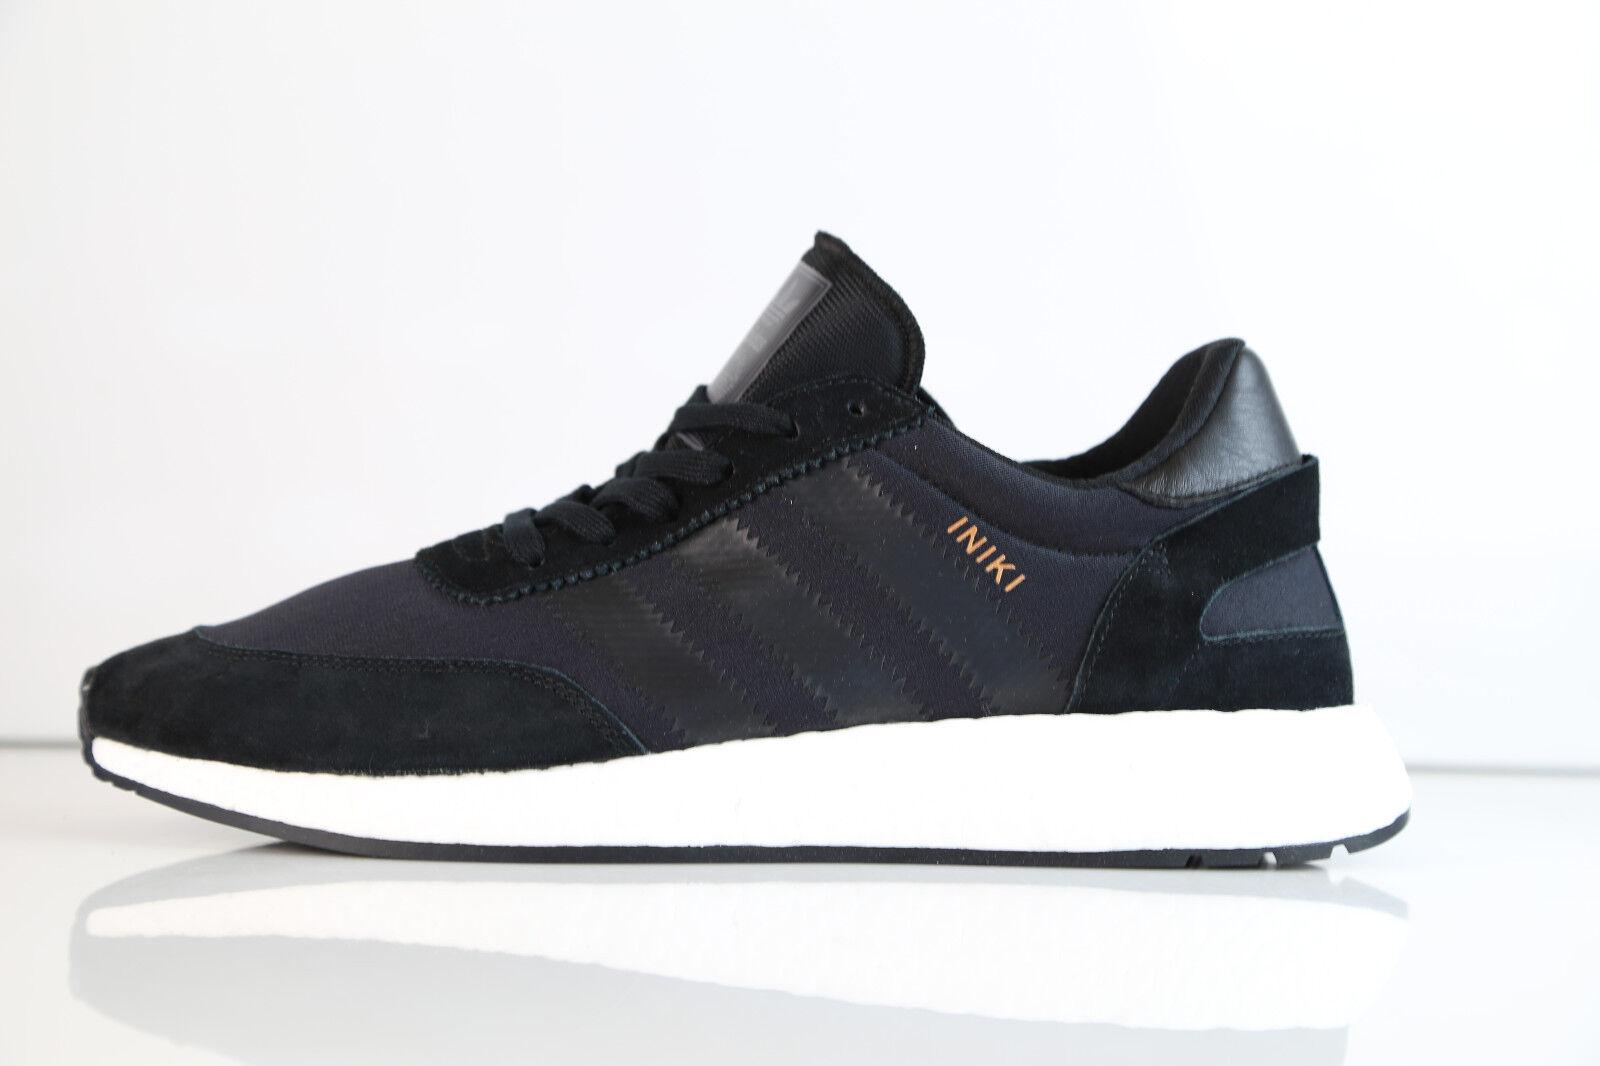 Adidas Boost Iniki Runner Black BB2100 8-12 ultra suede originals stan